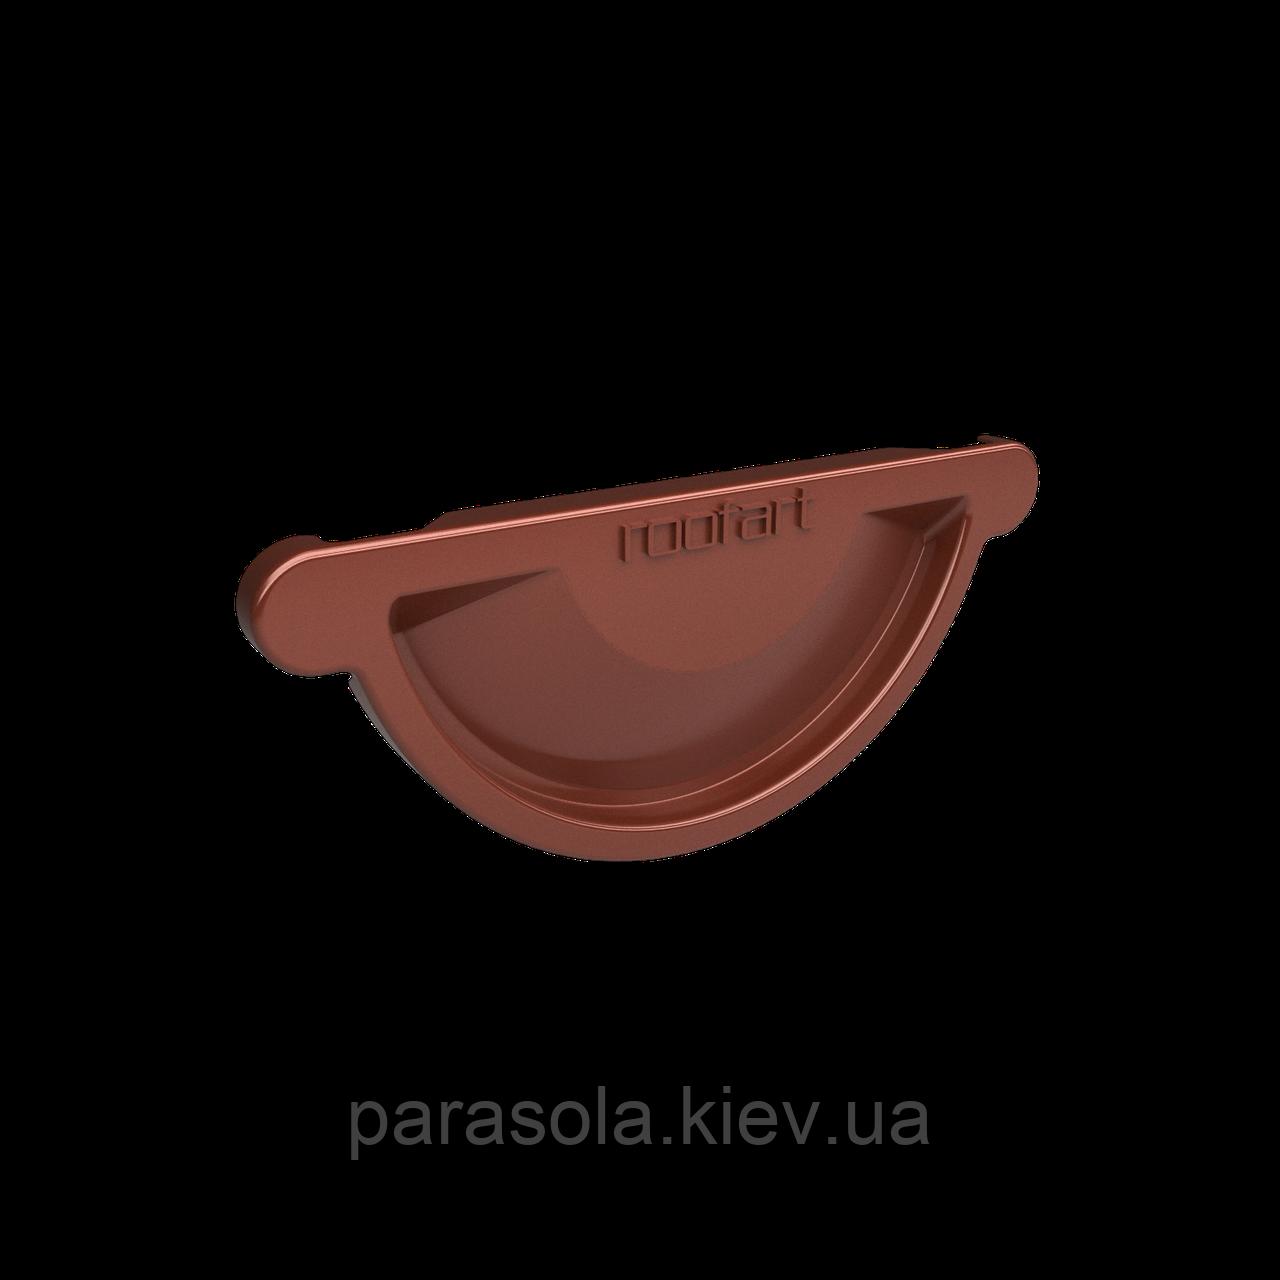 Roofart Заглушка универсальная Ø125/87